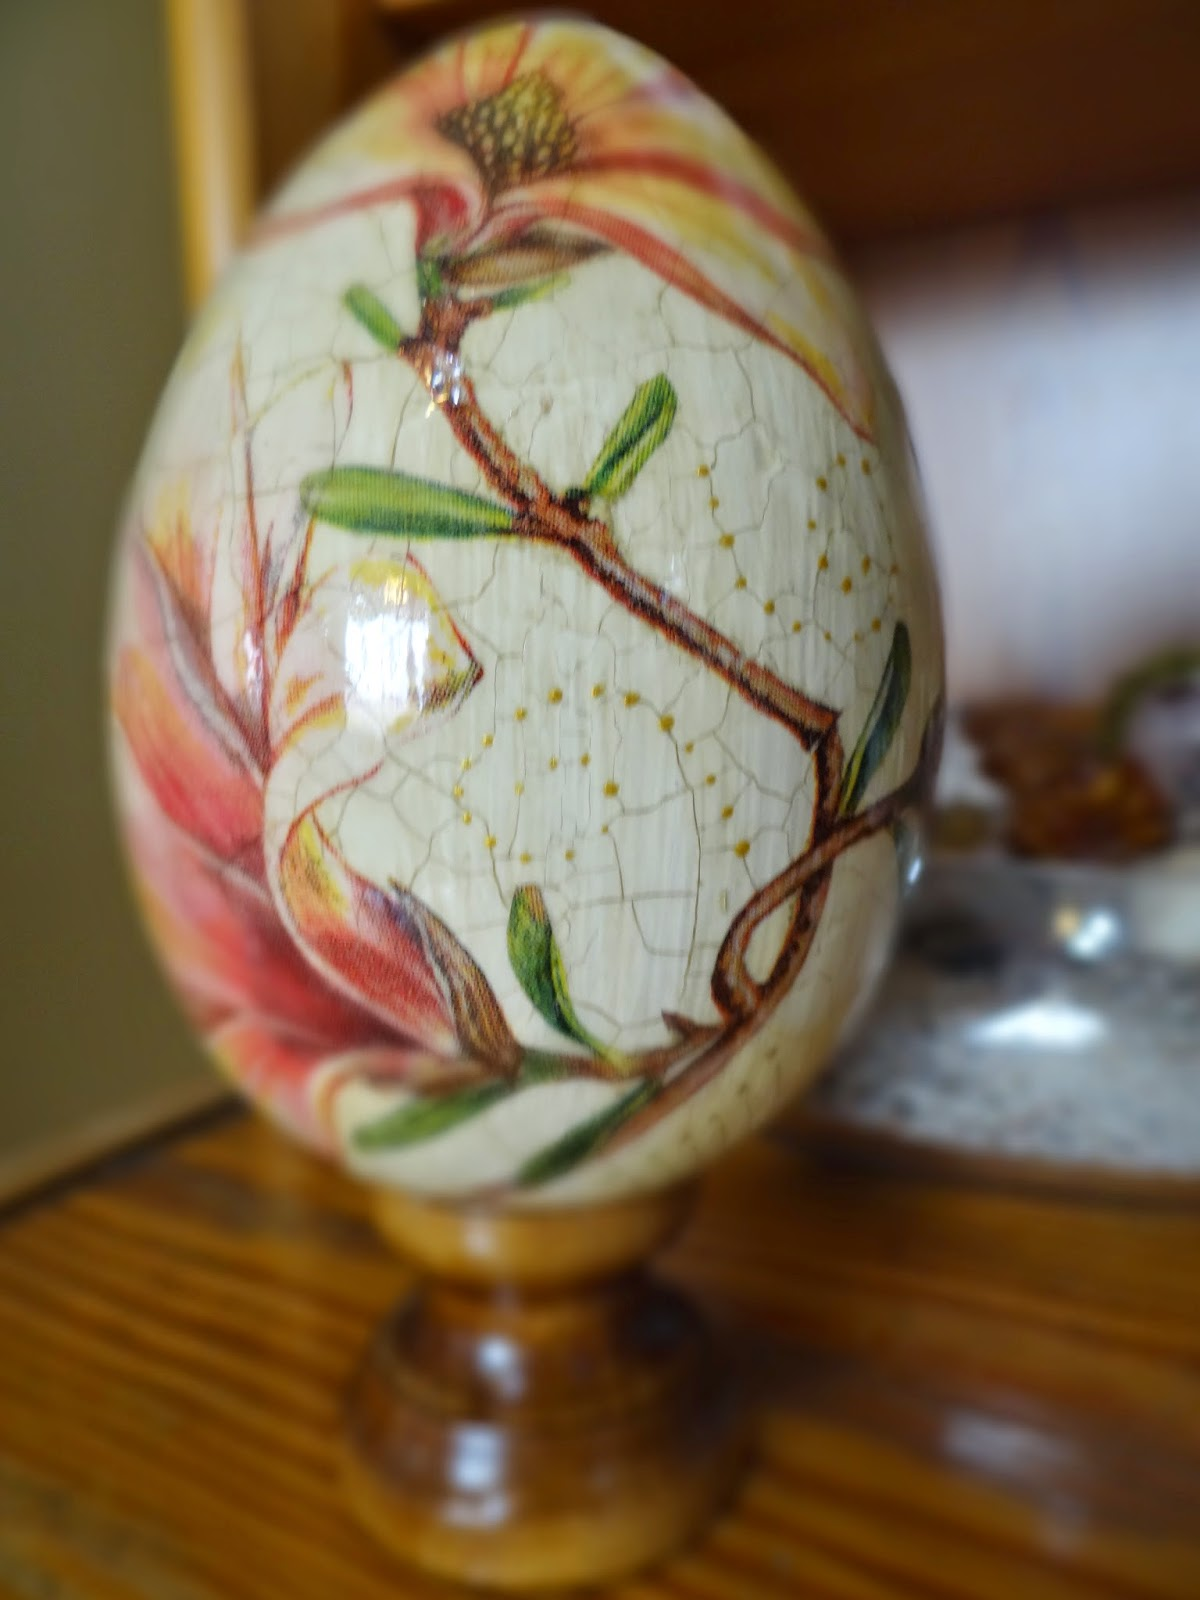 pisanka decoupage ze spękaniami, magnolia